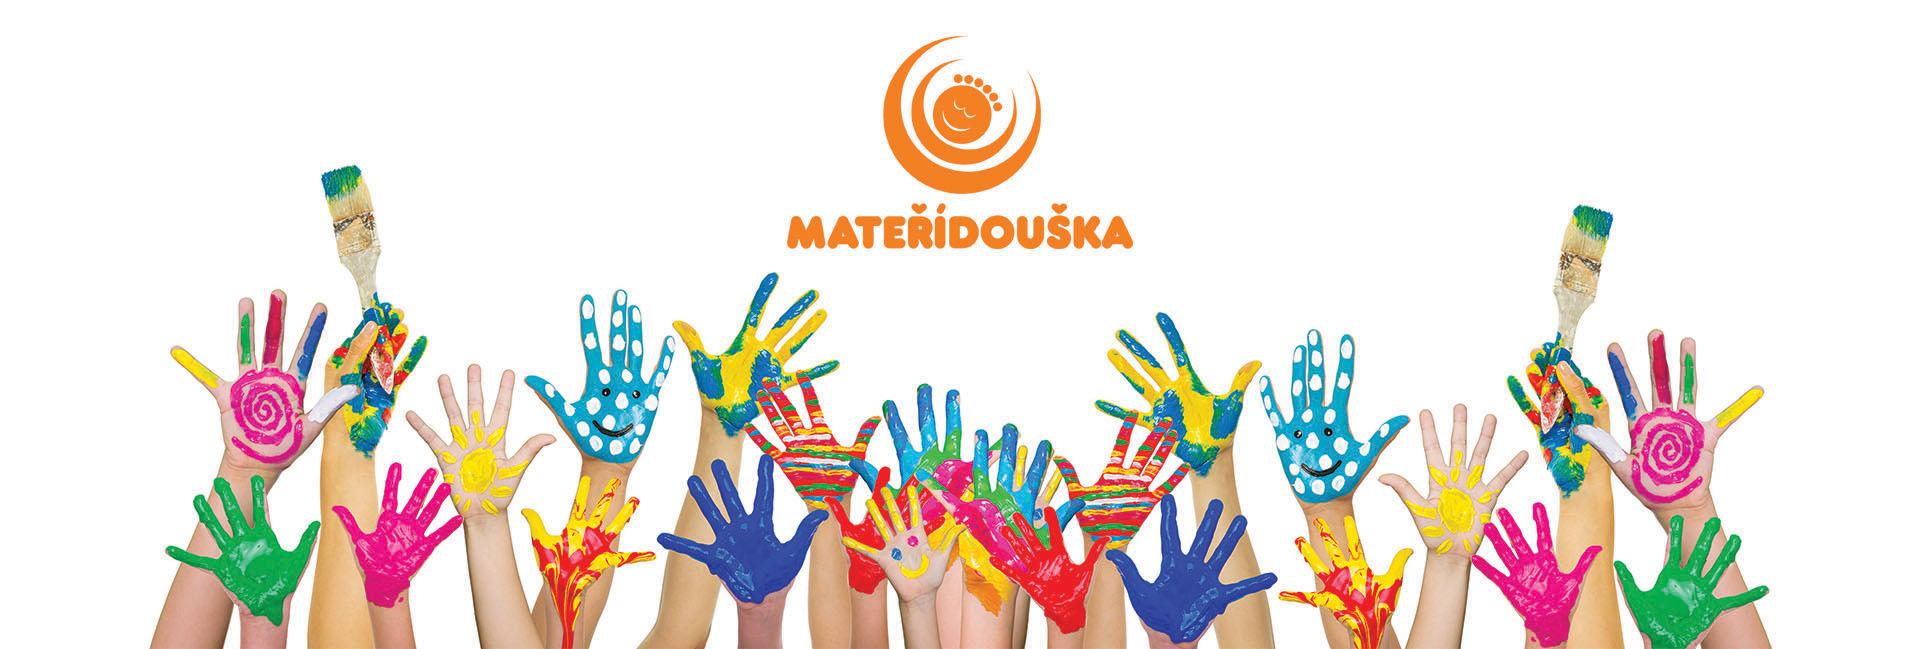 materidouska.net